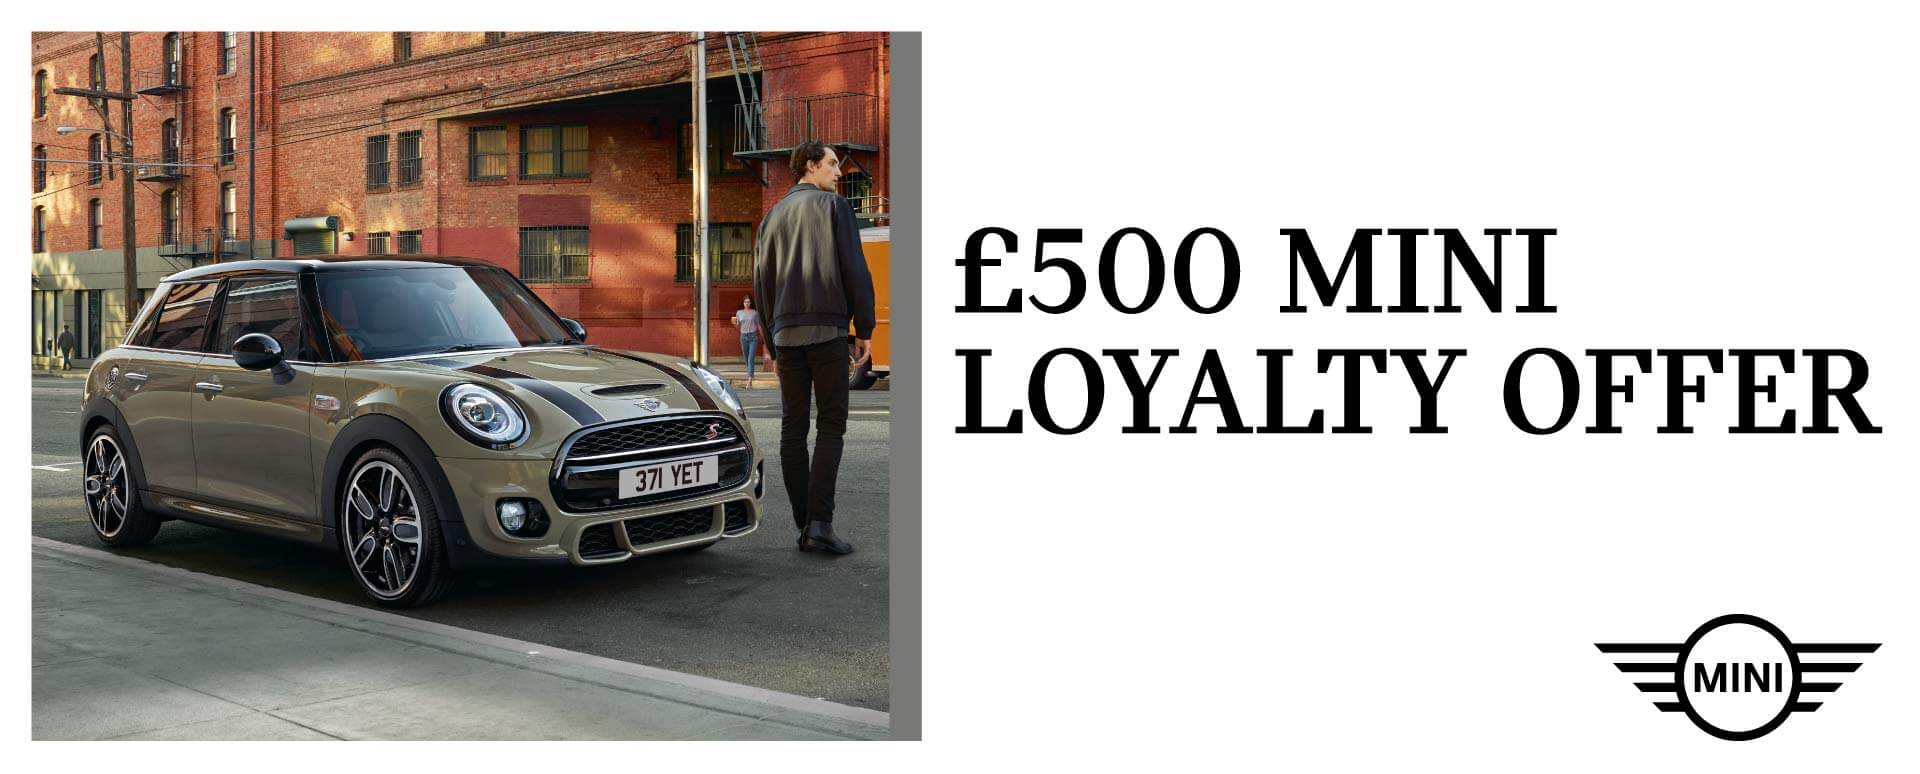 MINI Loyalty Offer